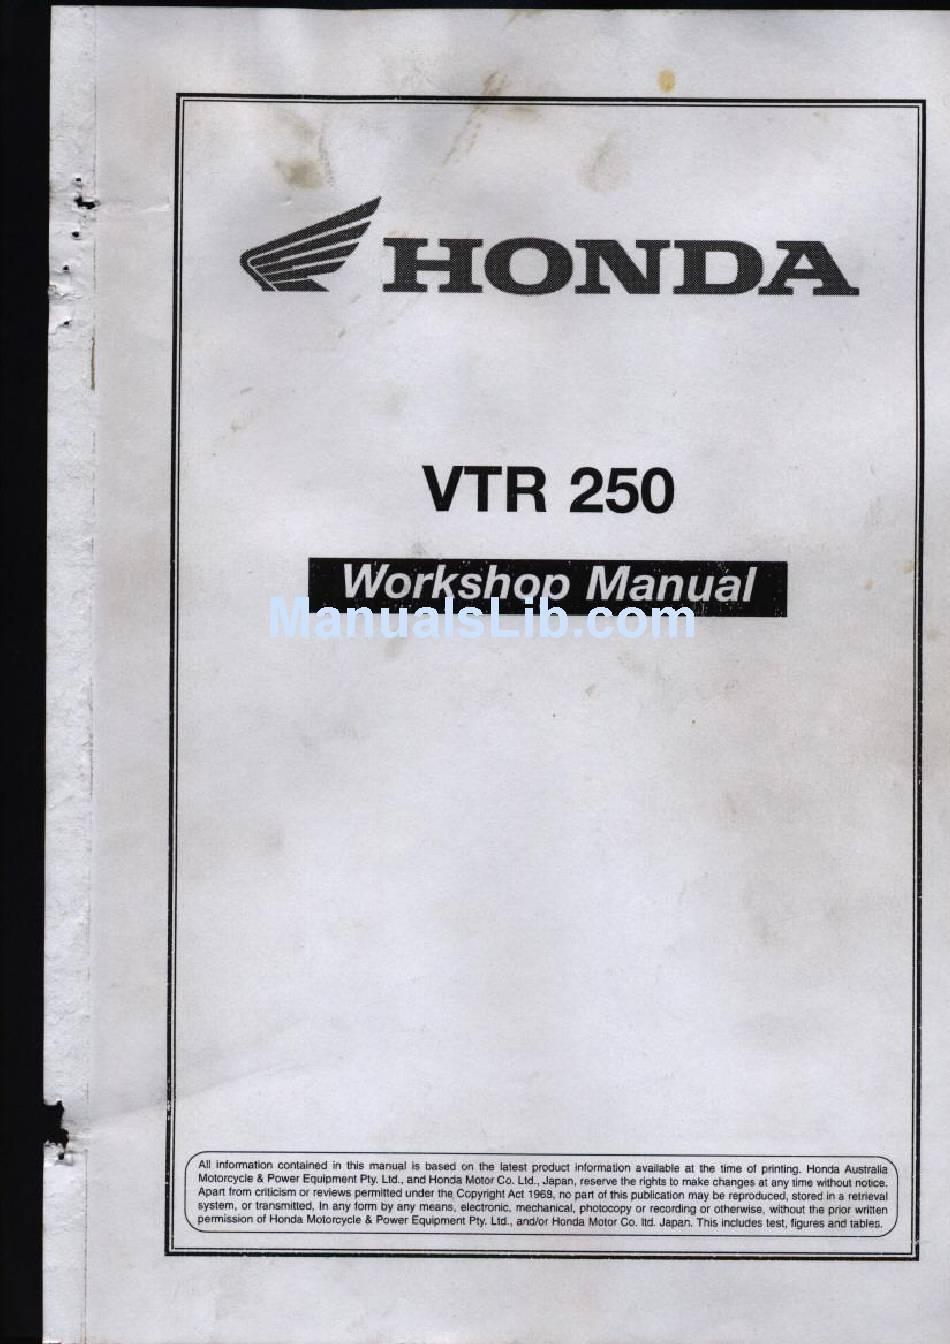 HONDA VTR 250 WORKSHOP MANUAL Pdf Download | ManualsLibManualsLib